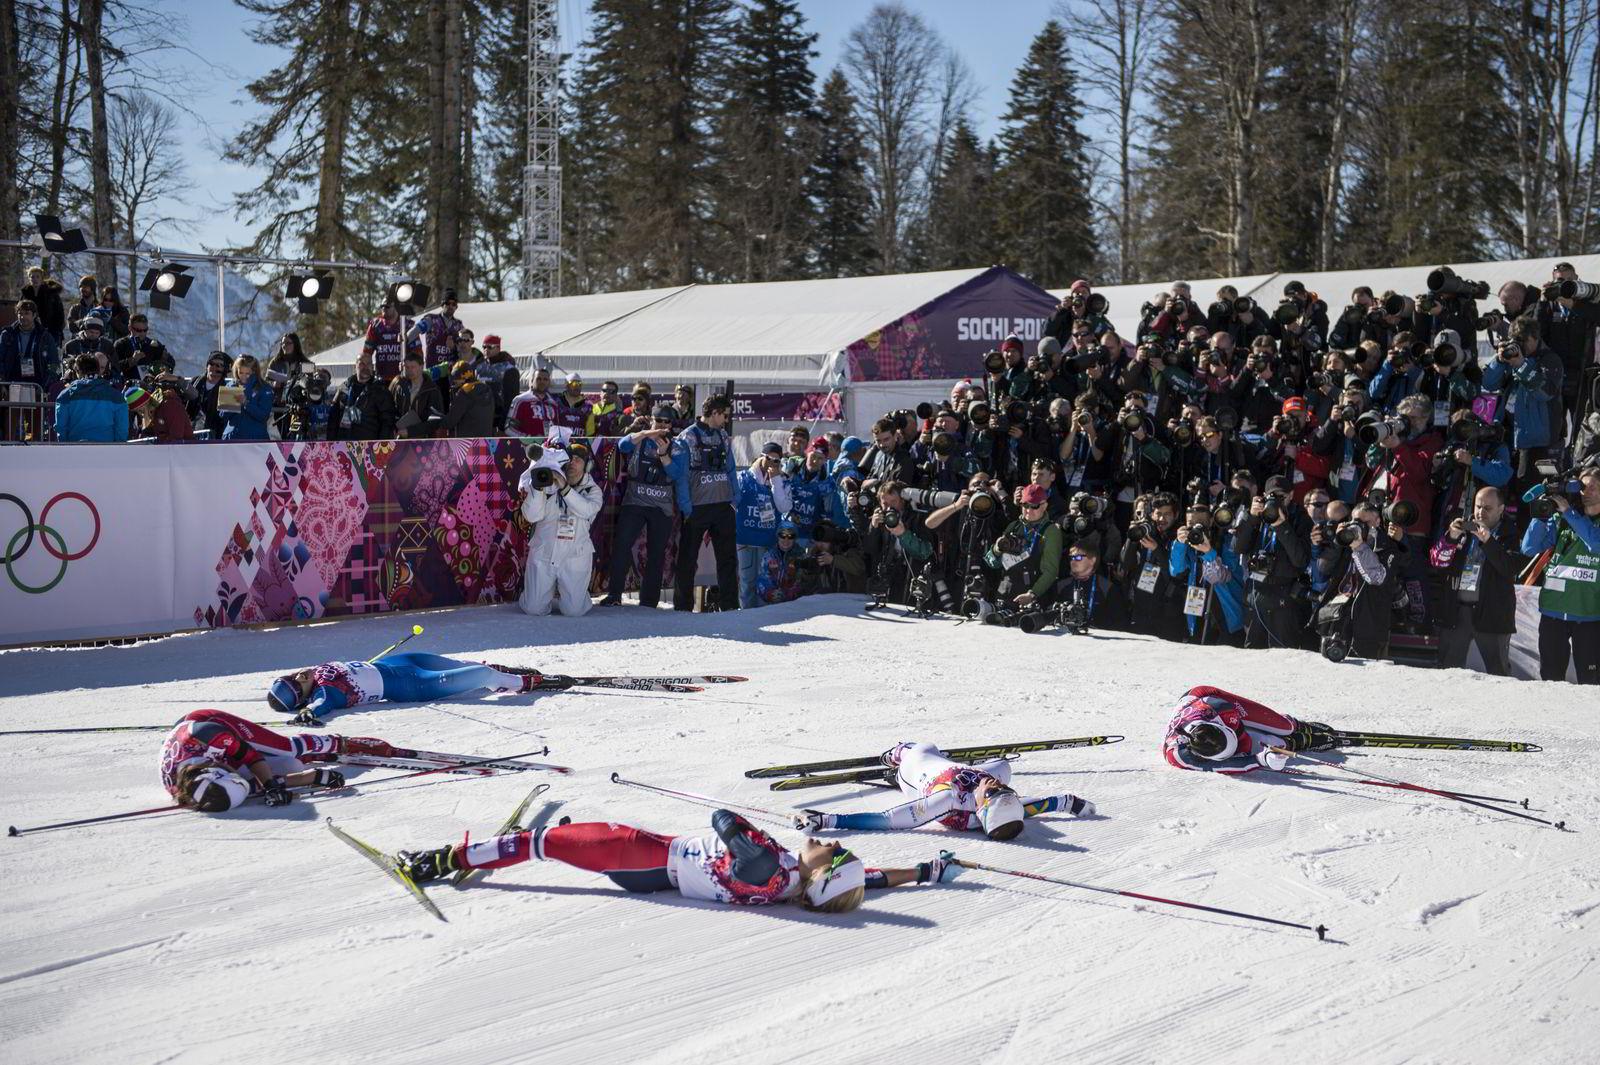 OL i Sotsji 2014.